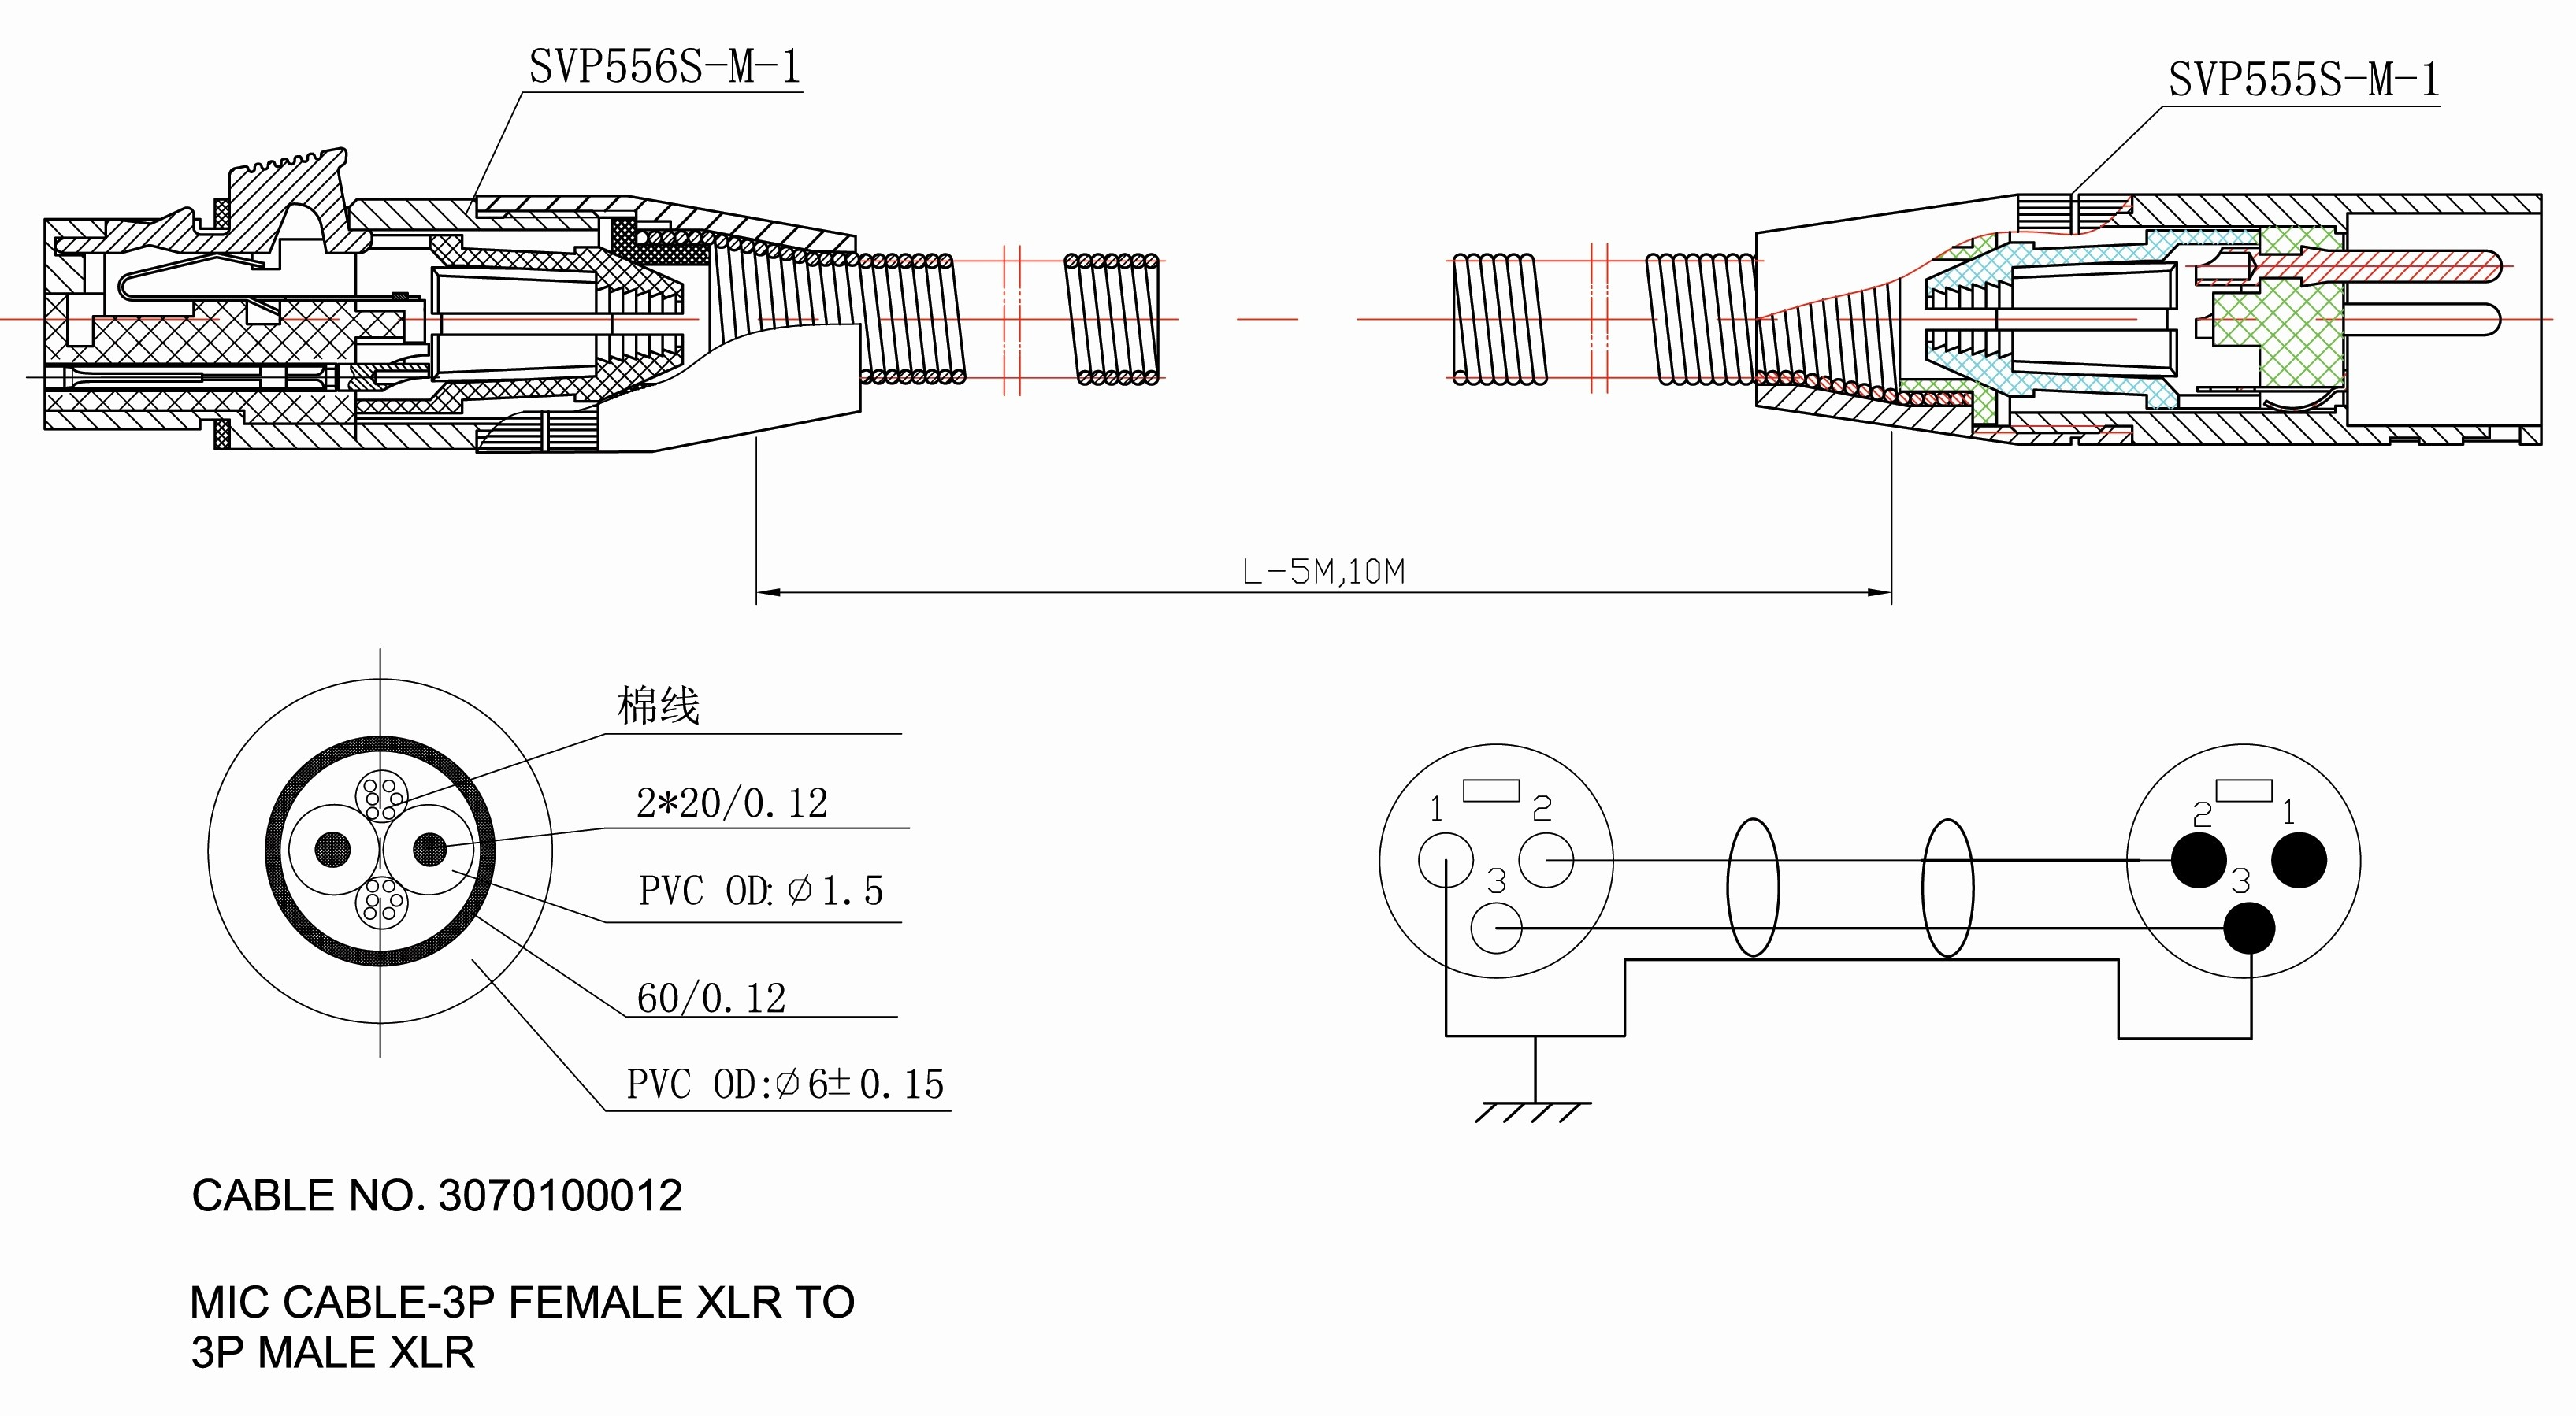 Truck Lite 900 Wiring Diagram Signal Stat 900 Wiring Diagram Signal Stat 9000 Wiring ford Truck Of Truck Lite 900 Wiring Diagram